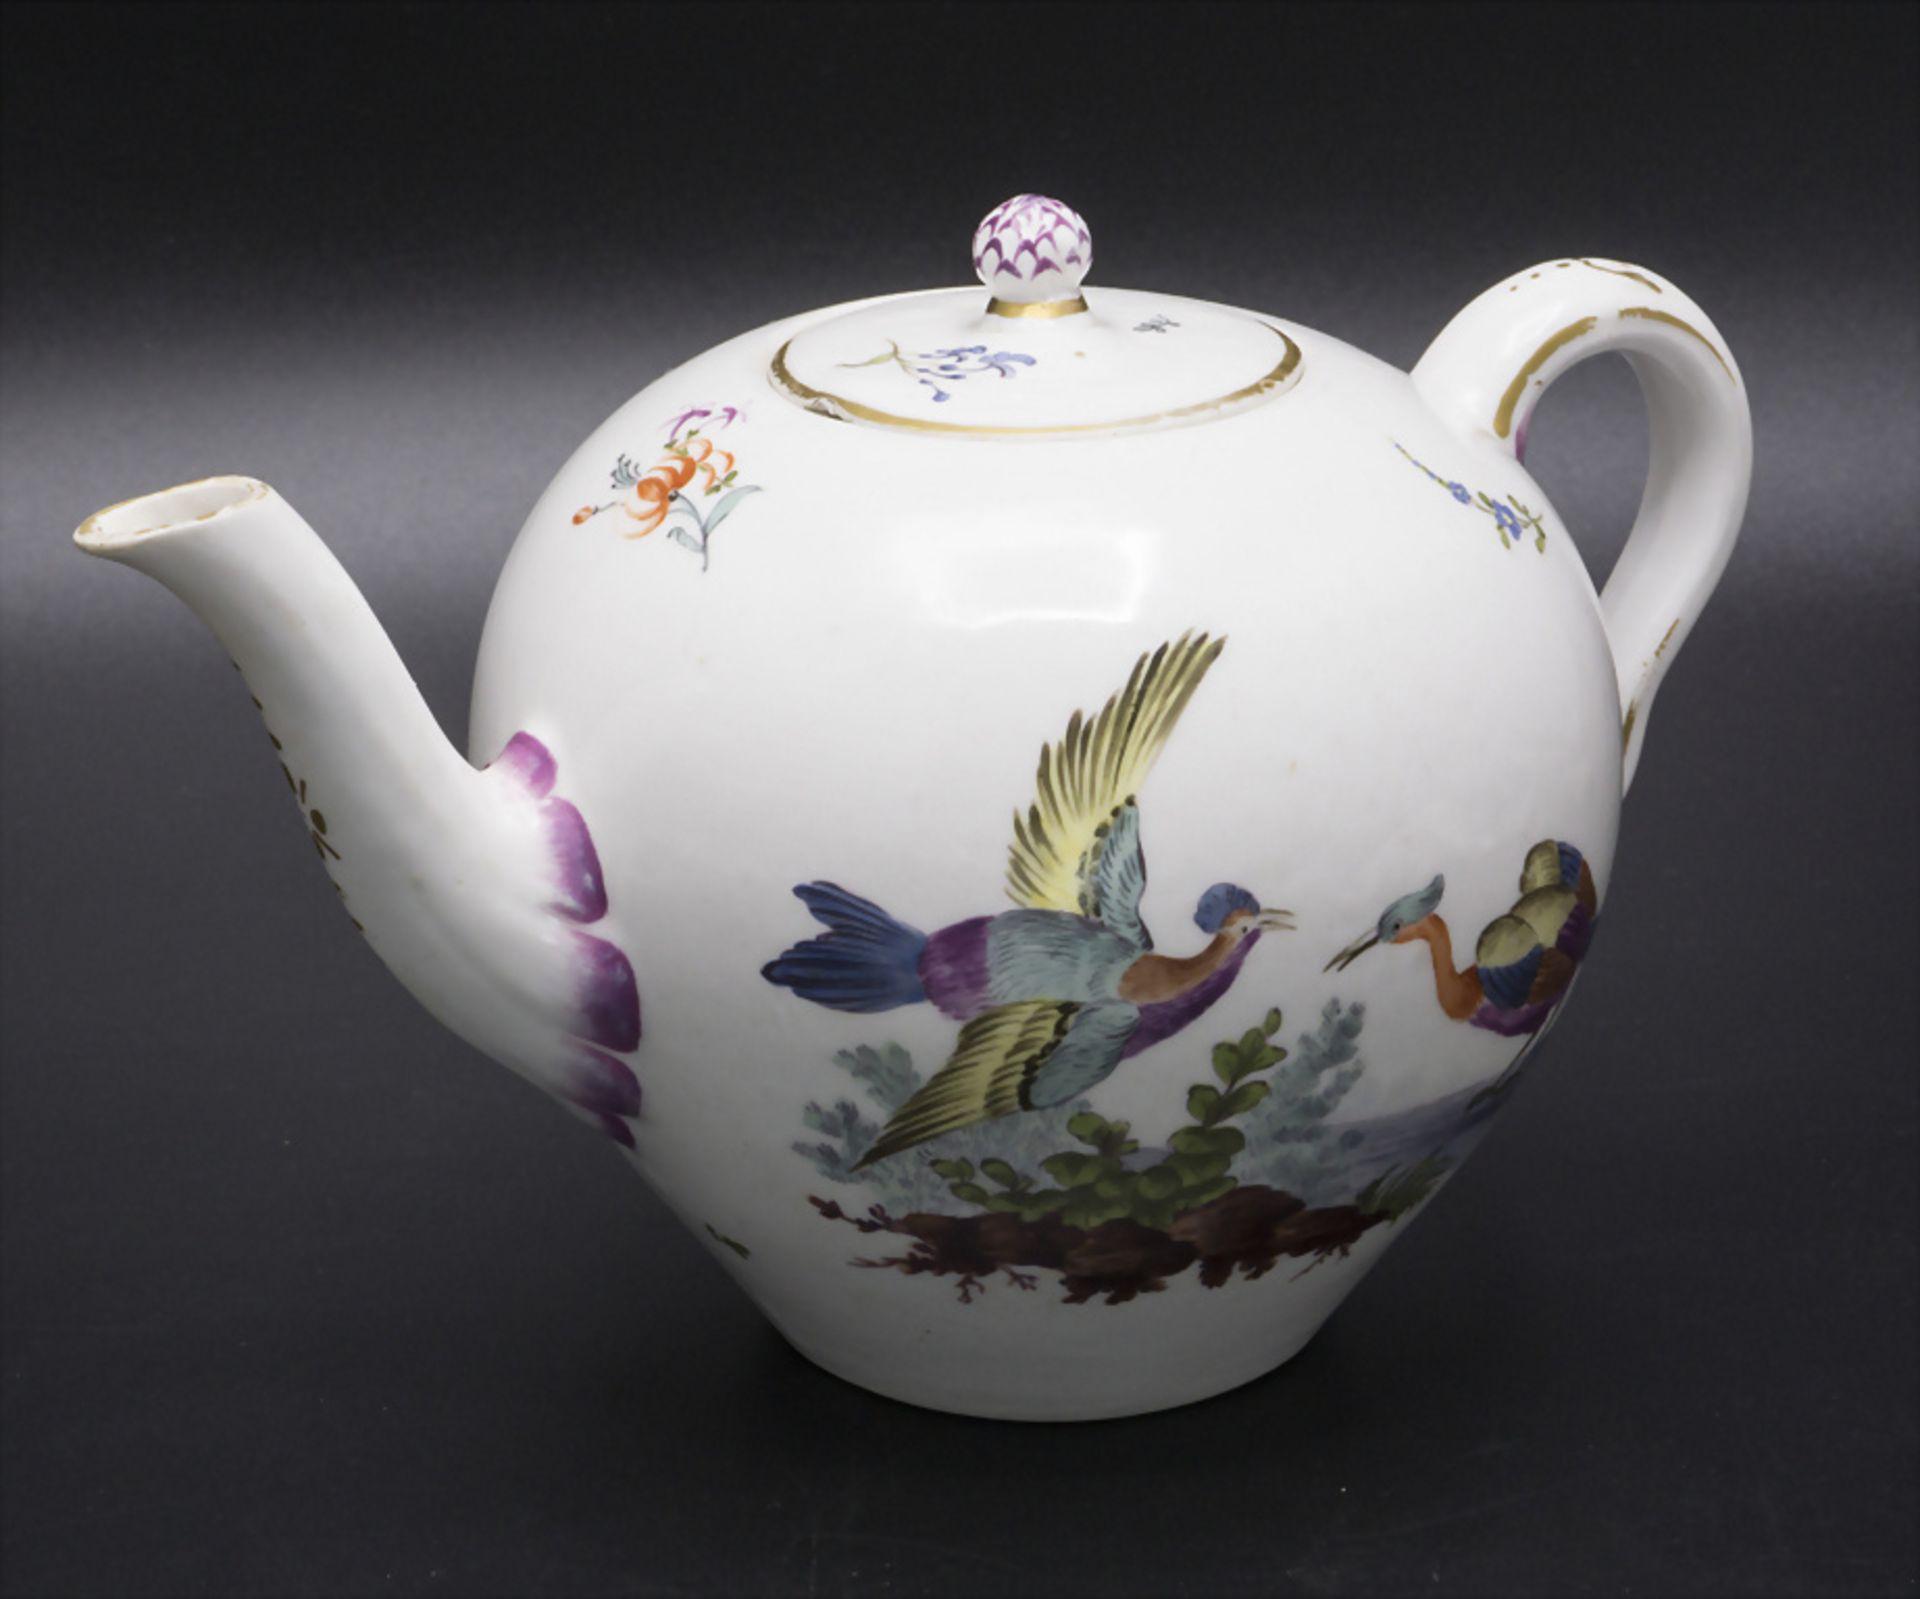 Teekanne mit galanter Szene / A tea pot with a courting scene, Frankenthal, um 1735